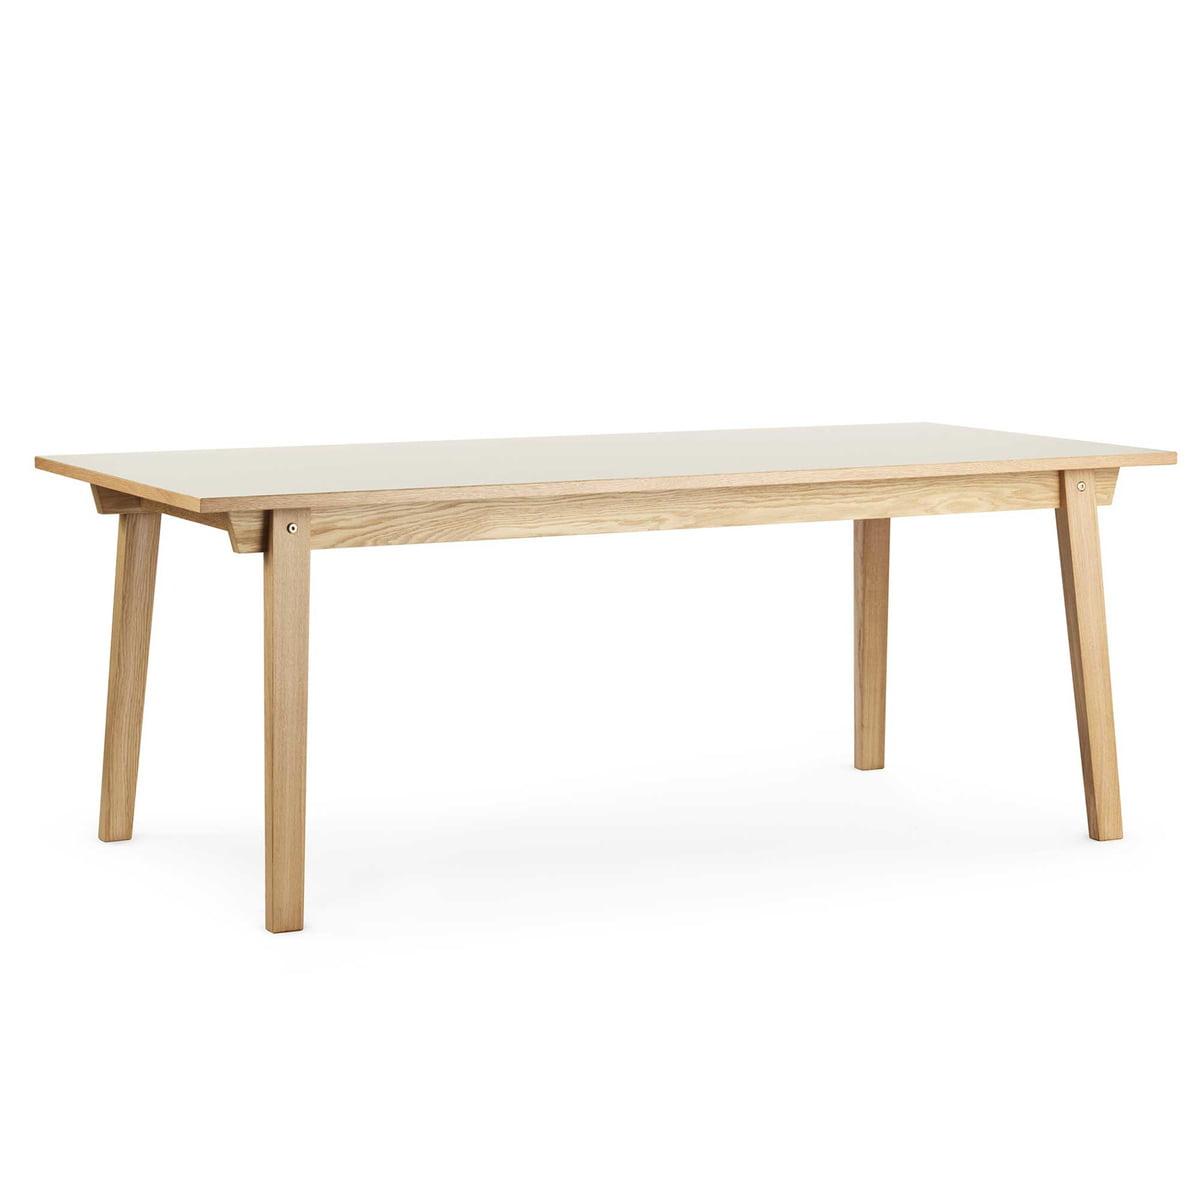 slice table linoleum 90 x 200 cm by normann copenhagen. Black Bedroom Furniture Sets. Home Design Ideas